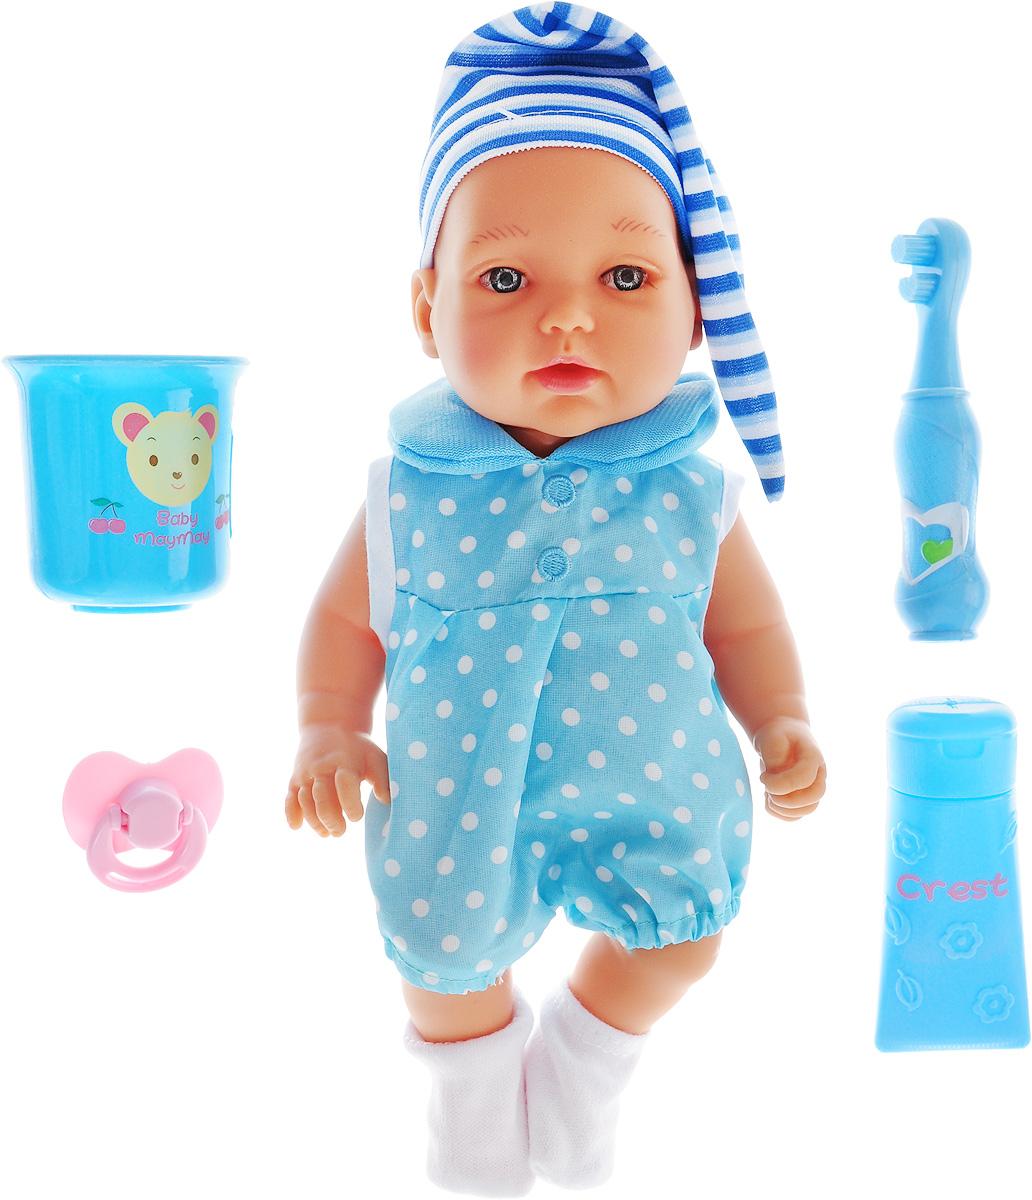 S+S Toys Пупс с аксессуарами цвет голубой 200099748 s s toys пупс с аксессуарами цвет голубой 200099748